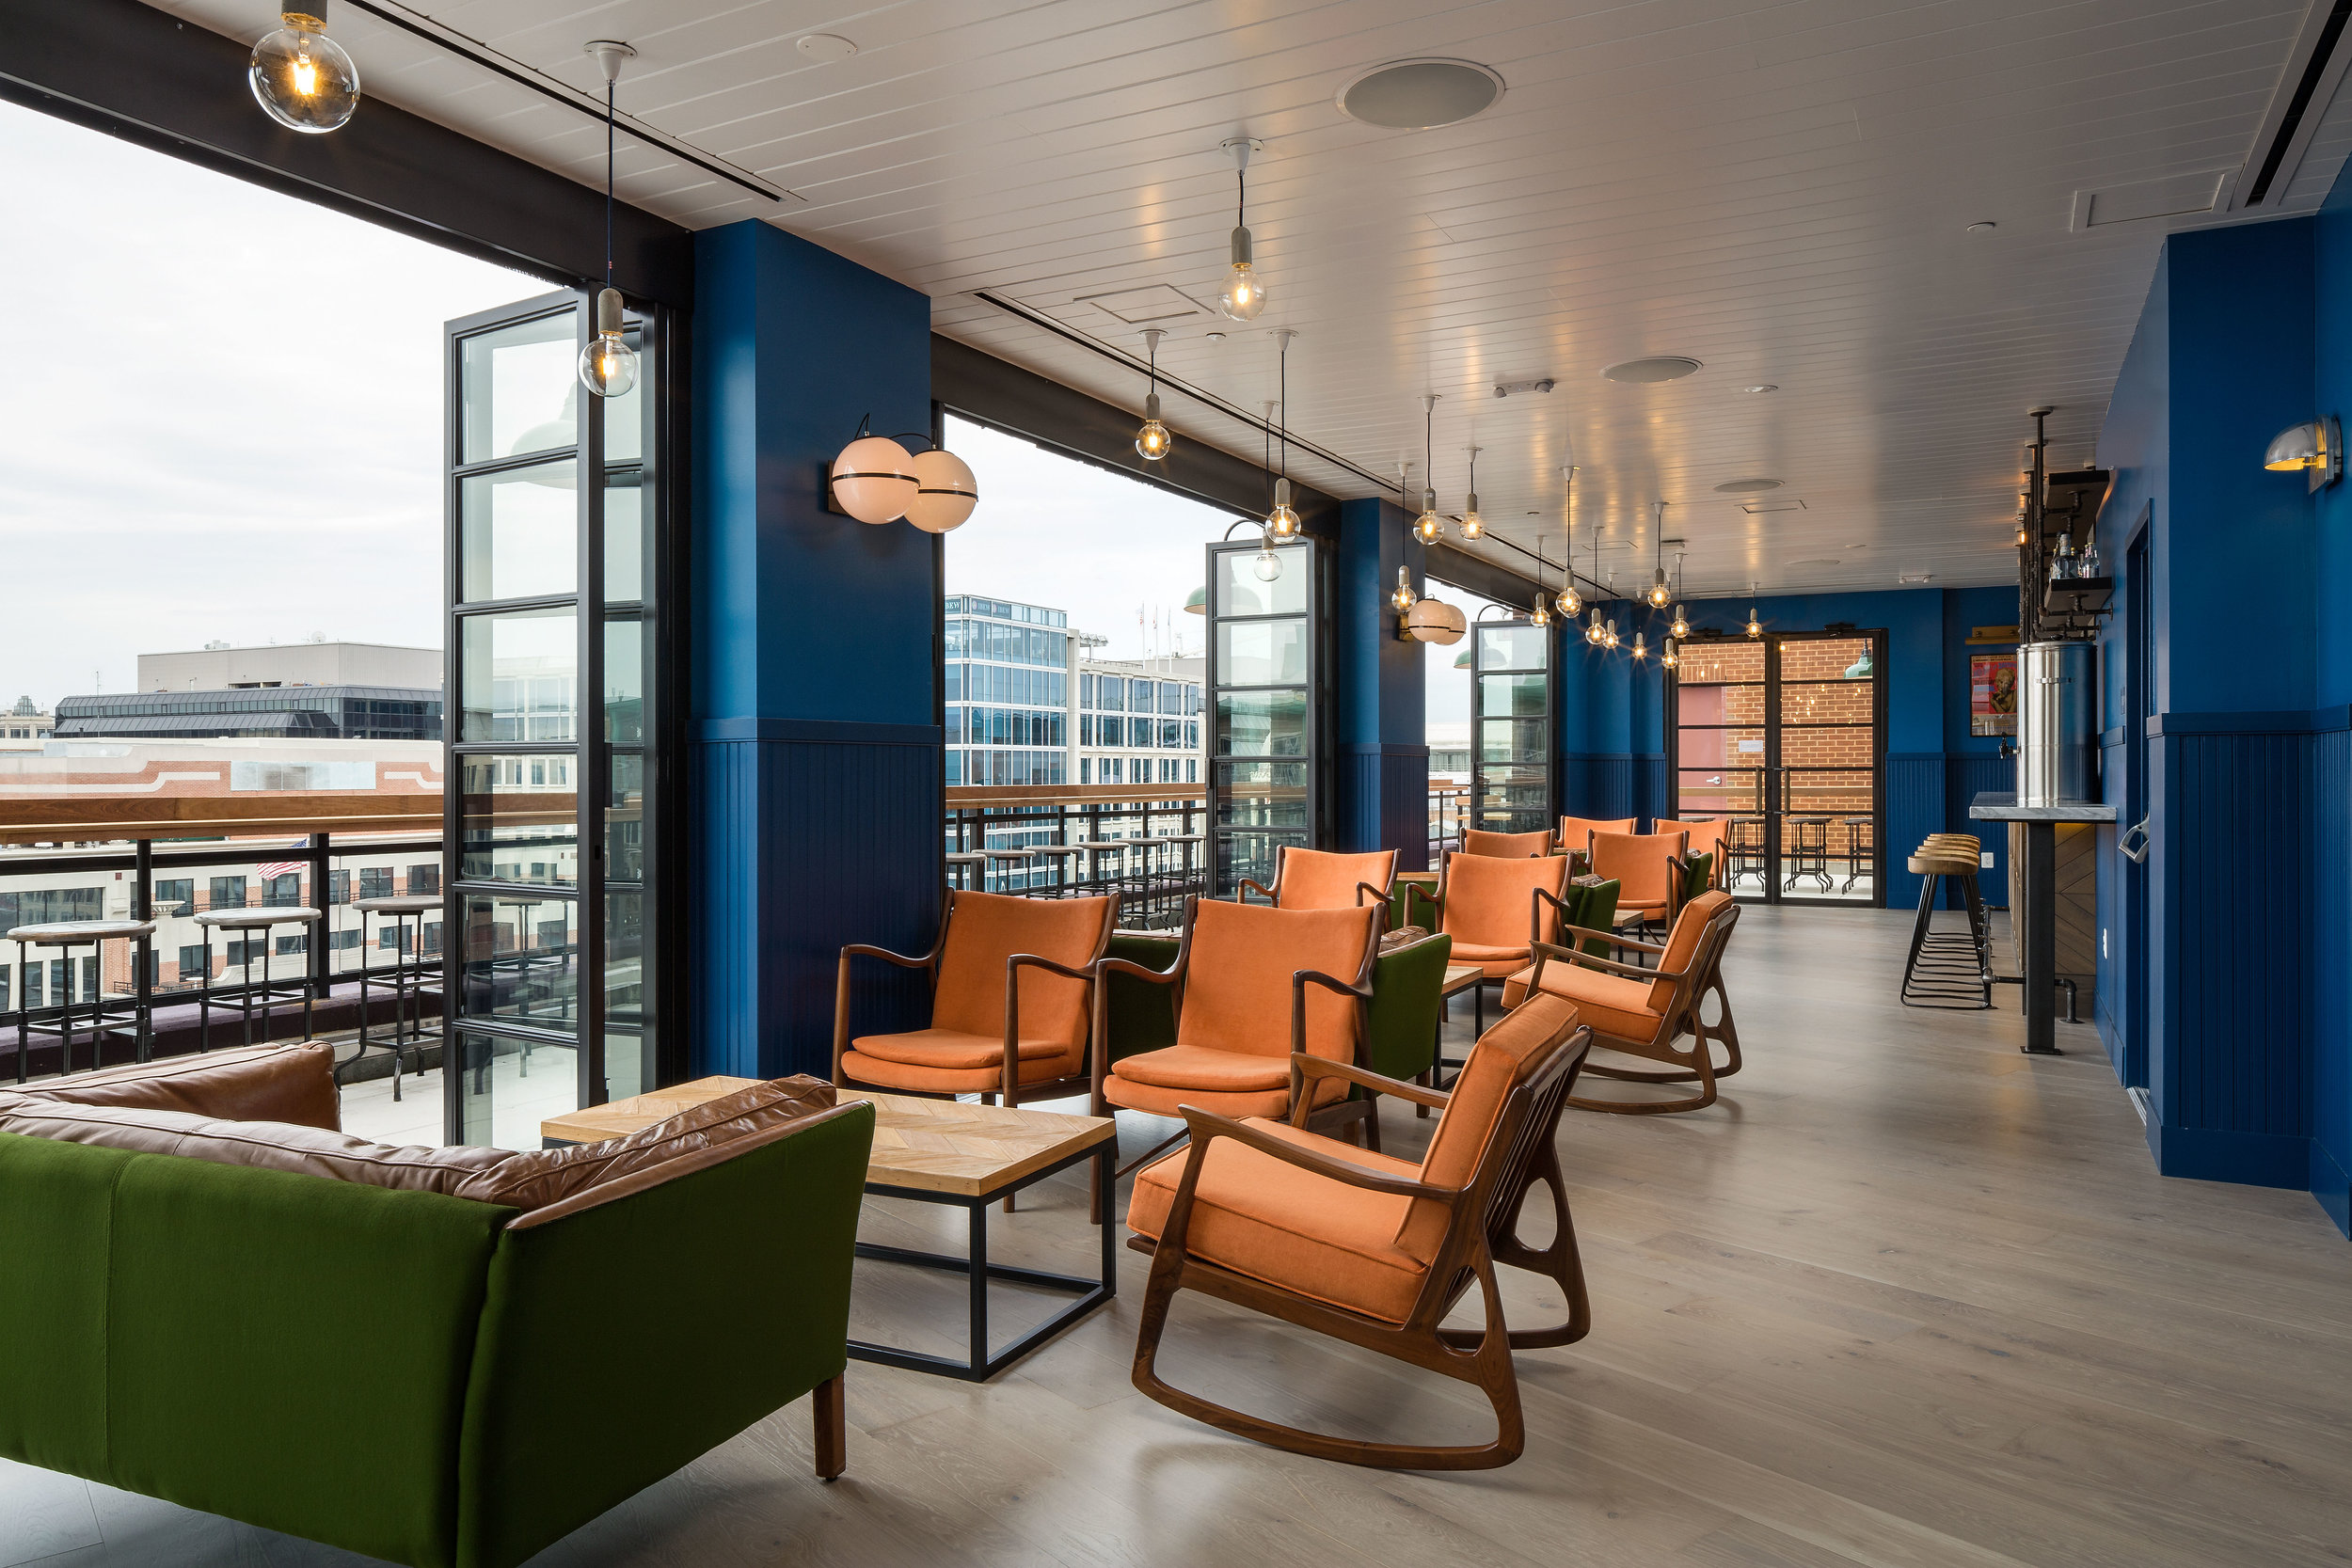 studio-saint-hotels-pod-hotel-washington-dc-15